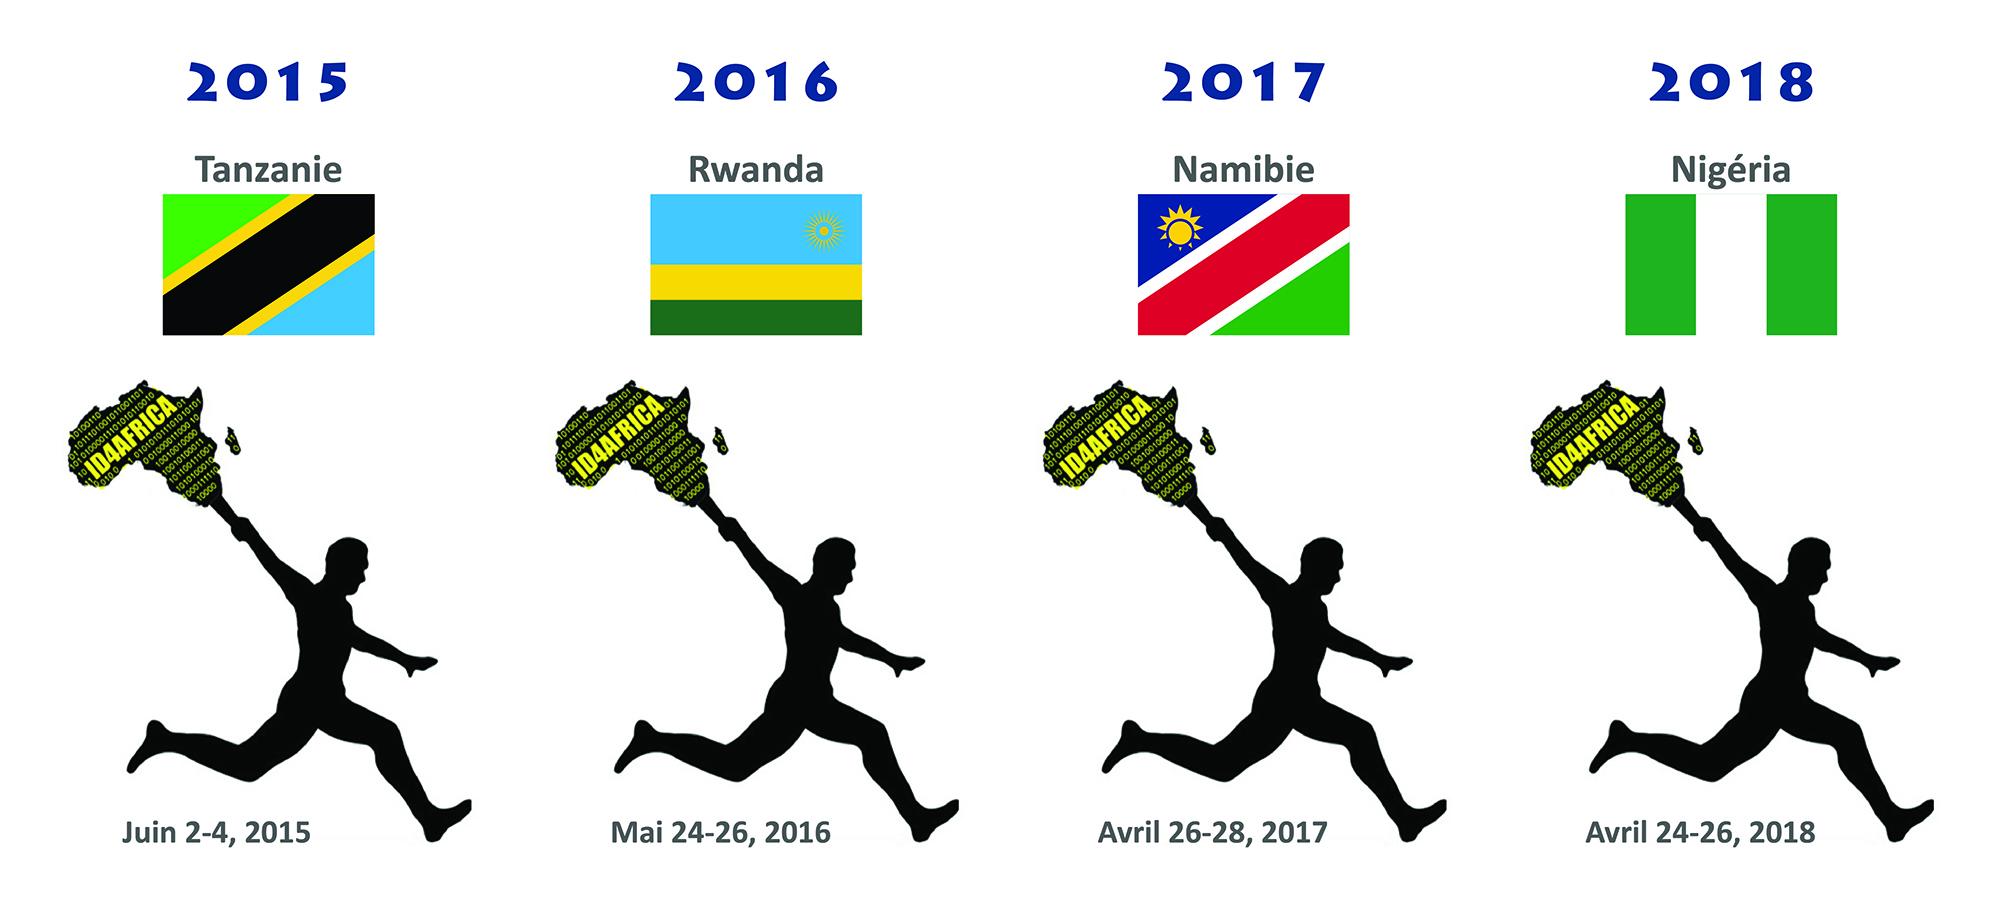 Nigeria Rwanda Namibia Tanzania